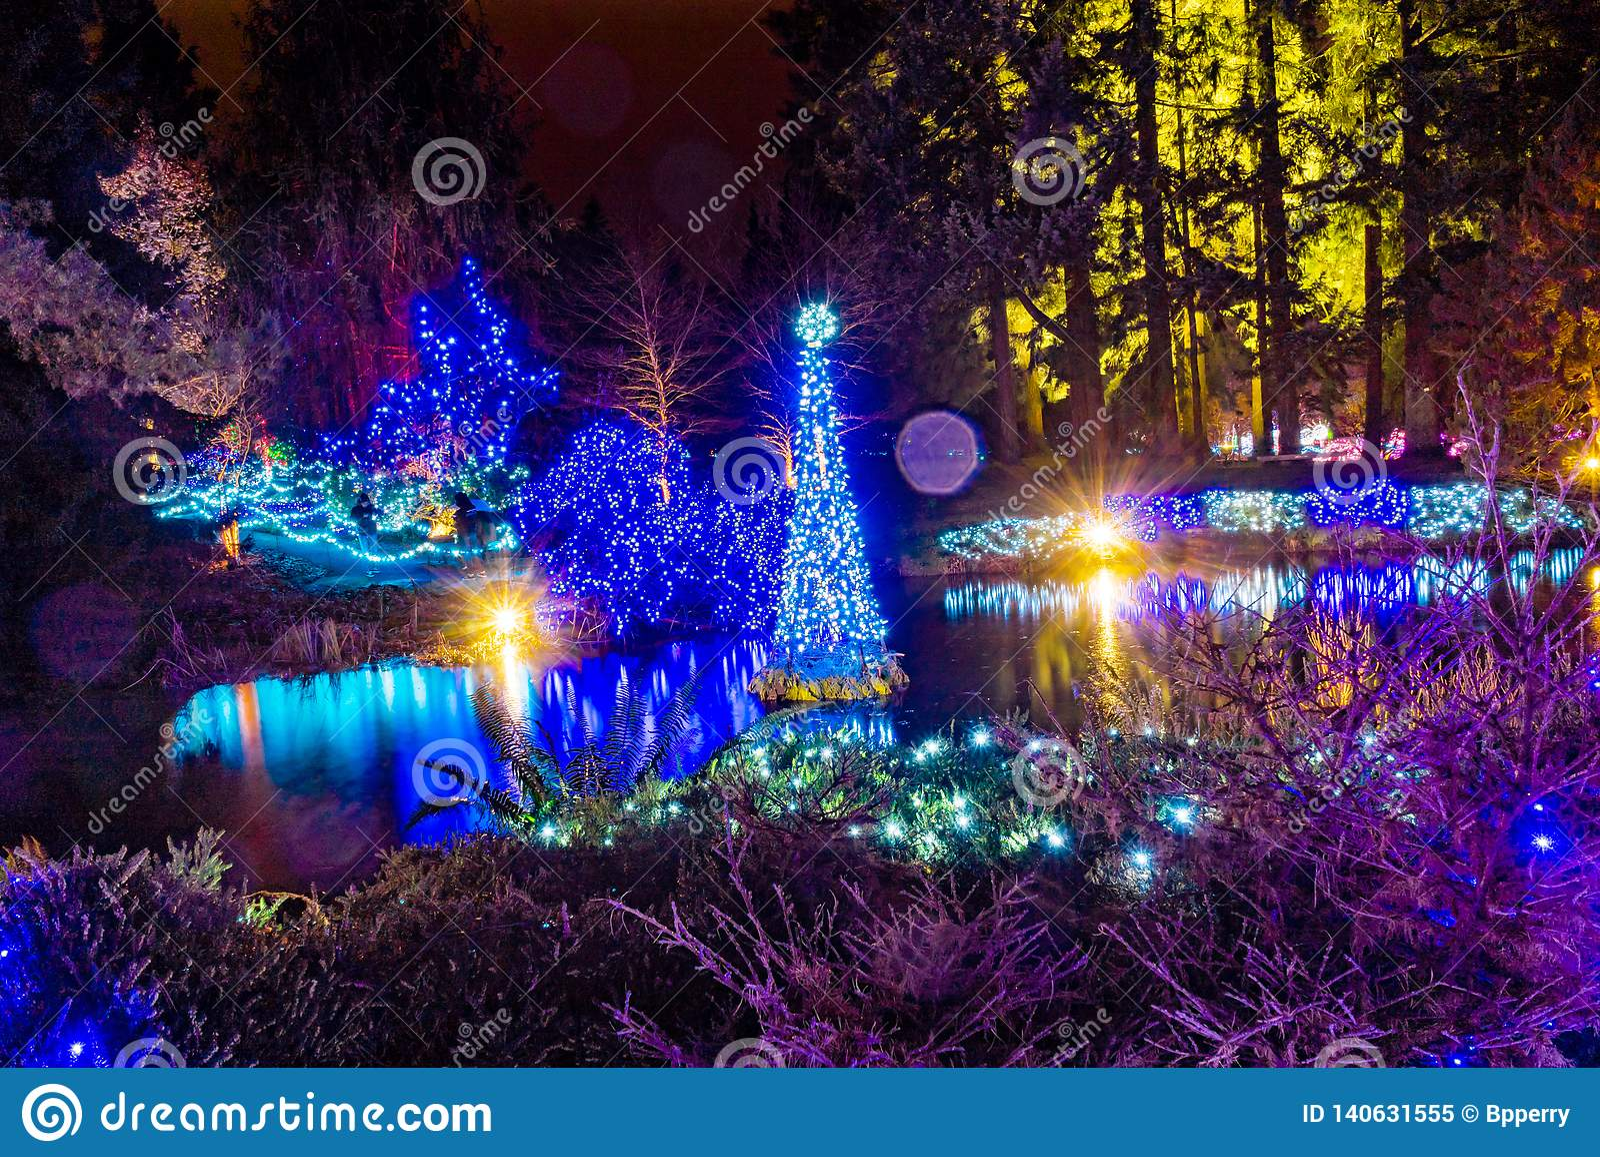 Vancouver Christmas Lights.Christmas Lights Reflection Van Dusen Garden Vancouver